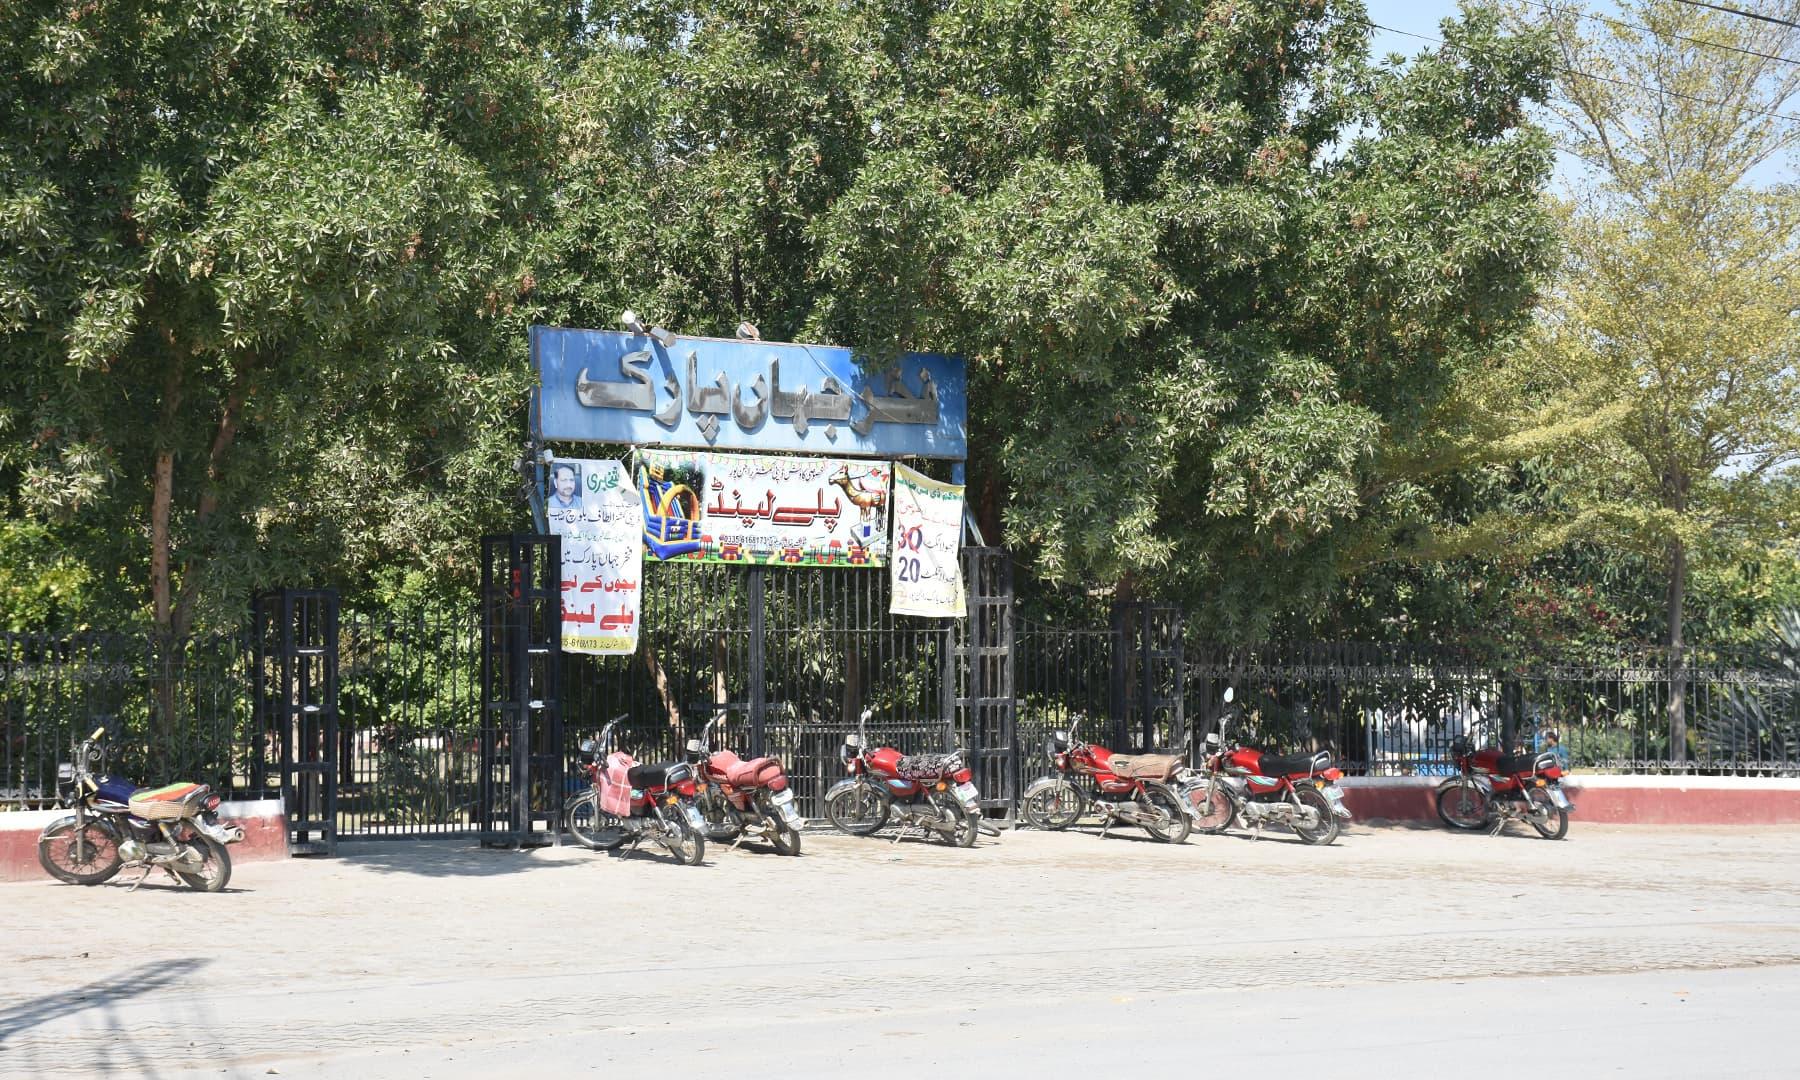 راجن پور کا فخر جہاں پارک—تصویر رمضان رفیق